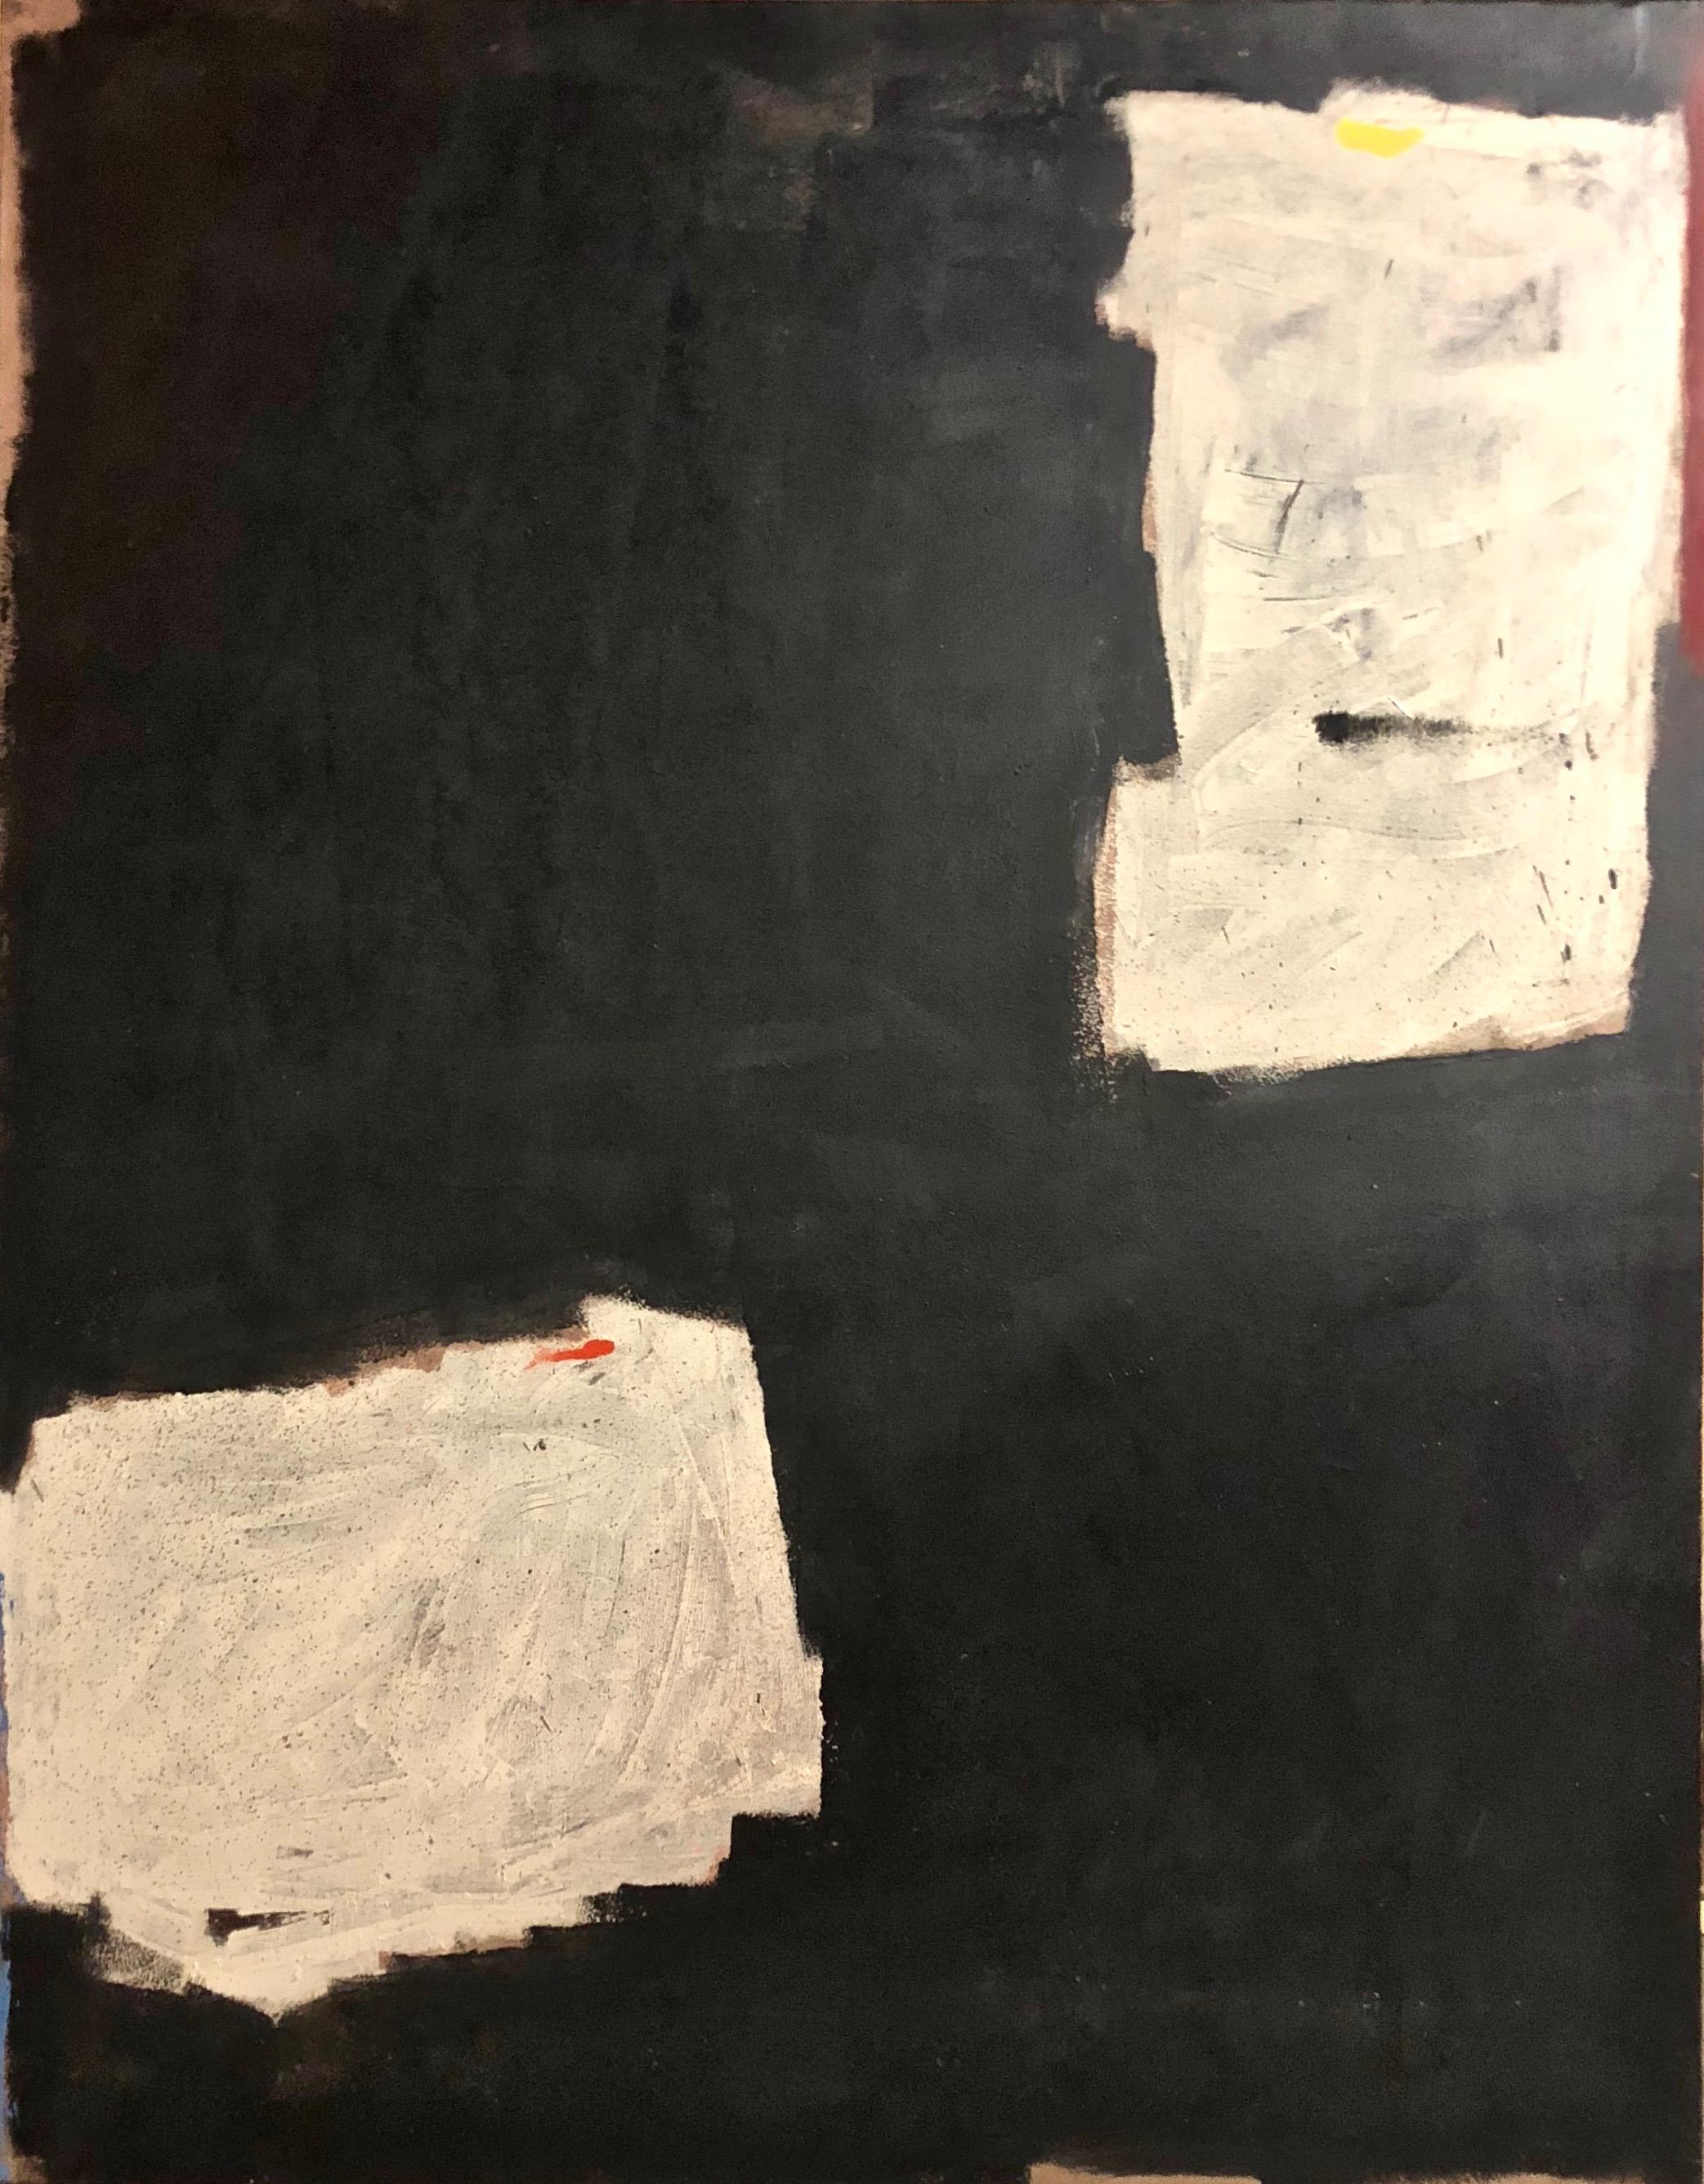 Archiac #70 , 1984 Oil on canvas 76 x 59 1/4 inches